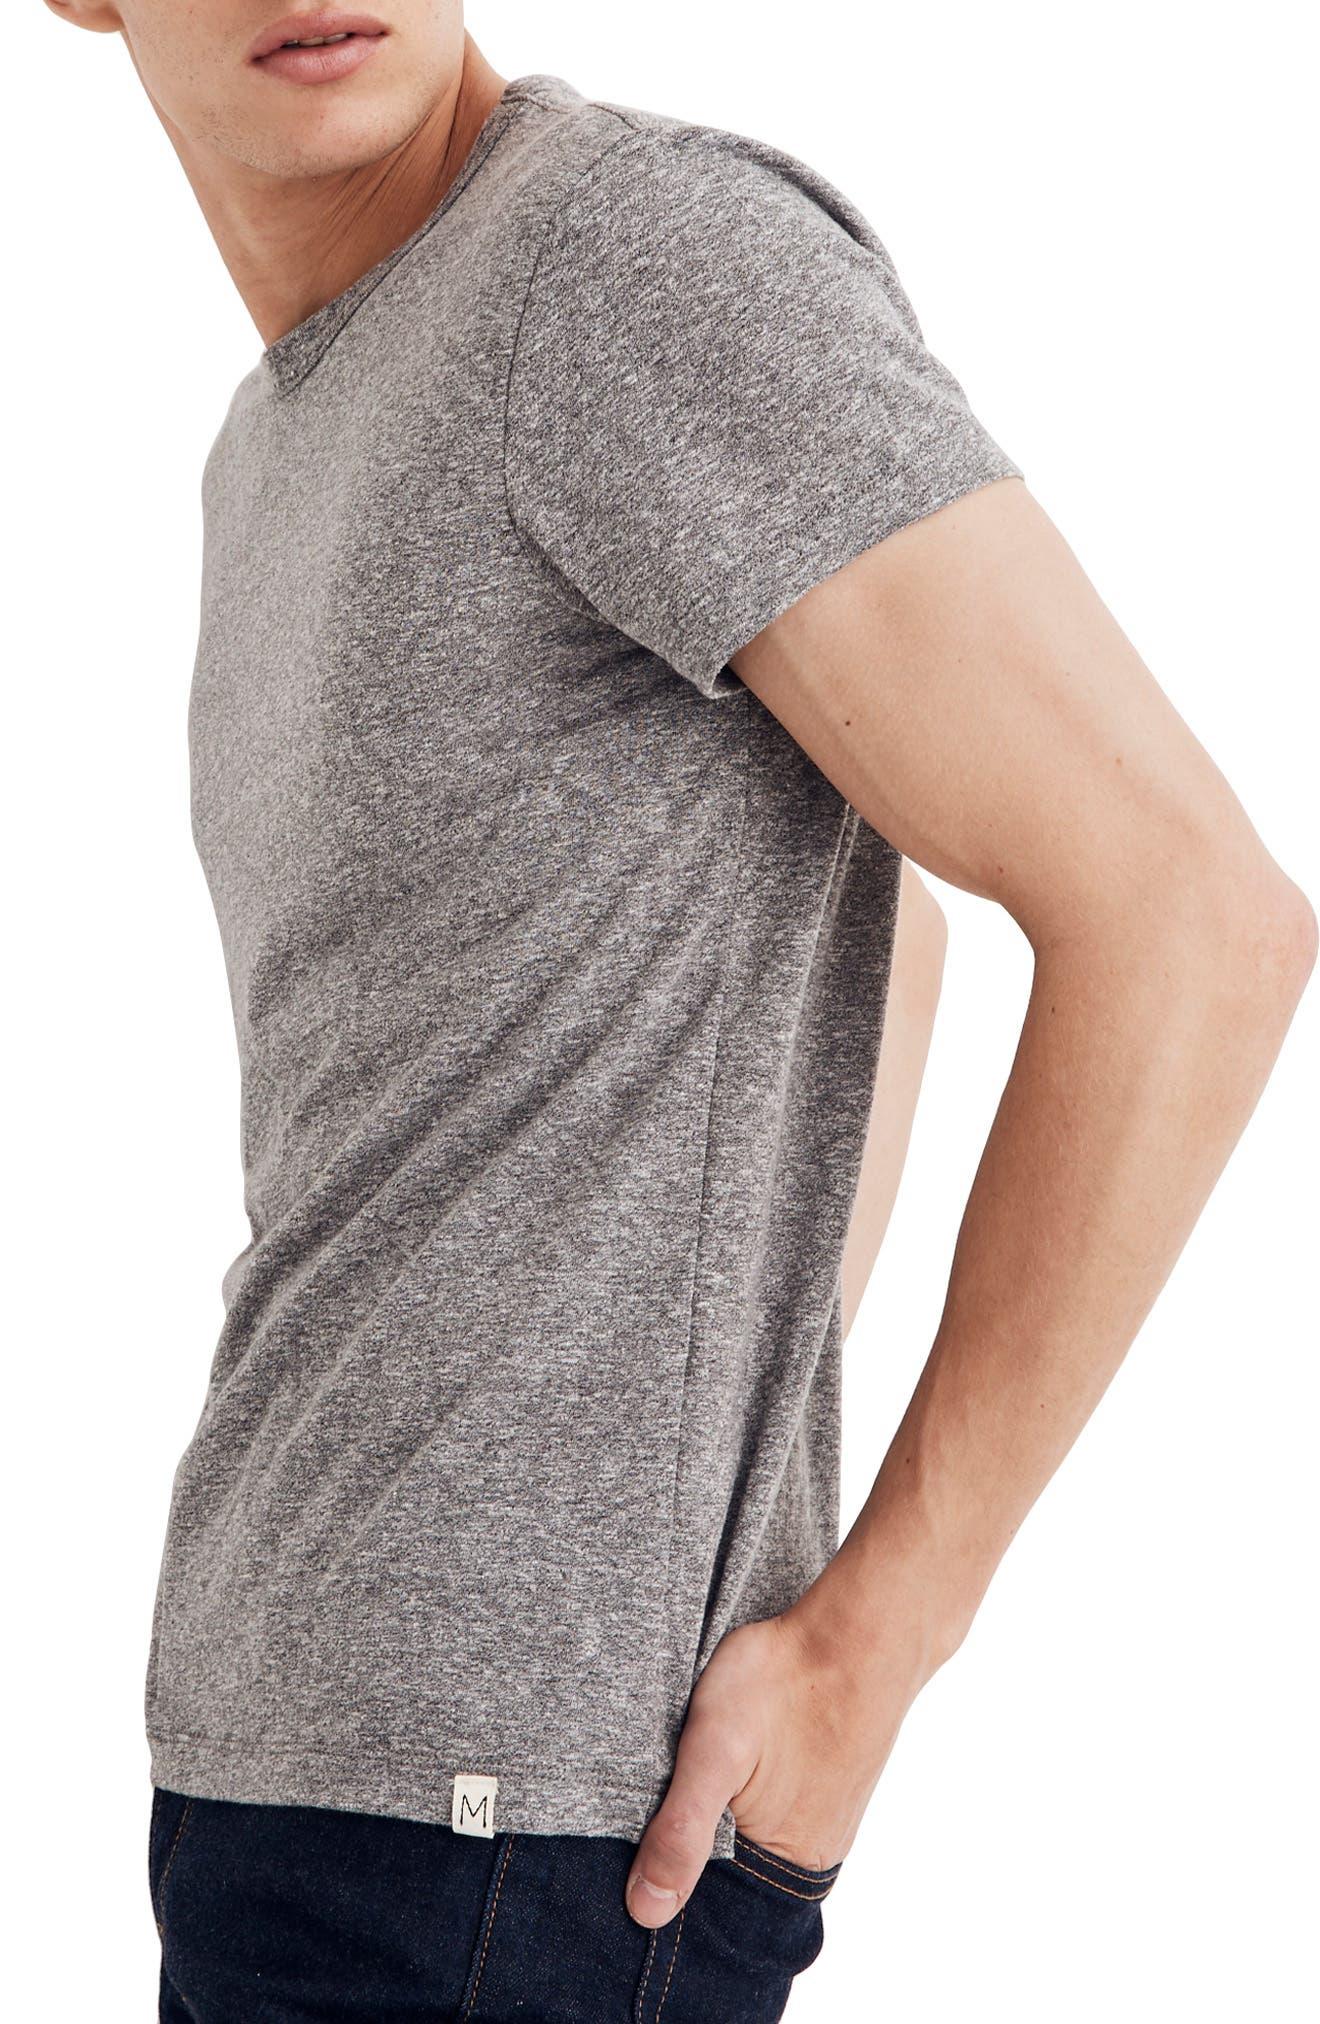 MADEWELL,                             Crewneck T-Shirt,                             Alternate thumbnail 3, color,                             HEATHER GREY